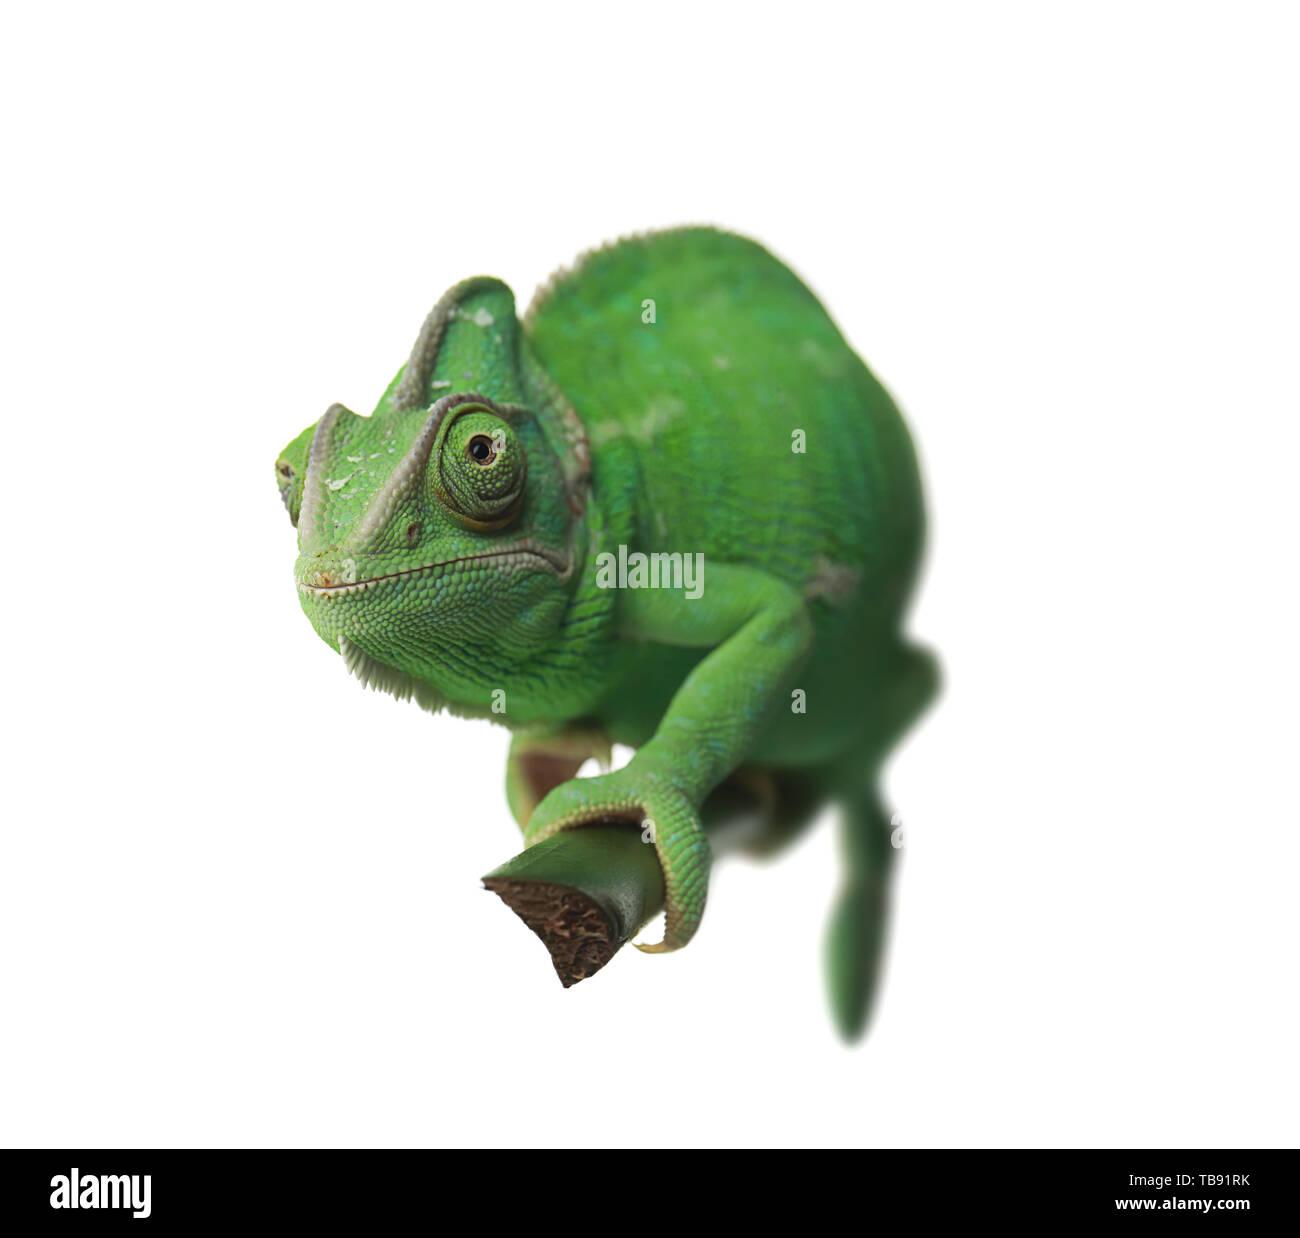 Cute green chameleon on branch against white background - Stock Image